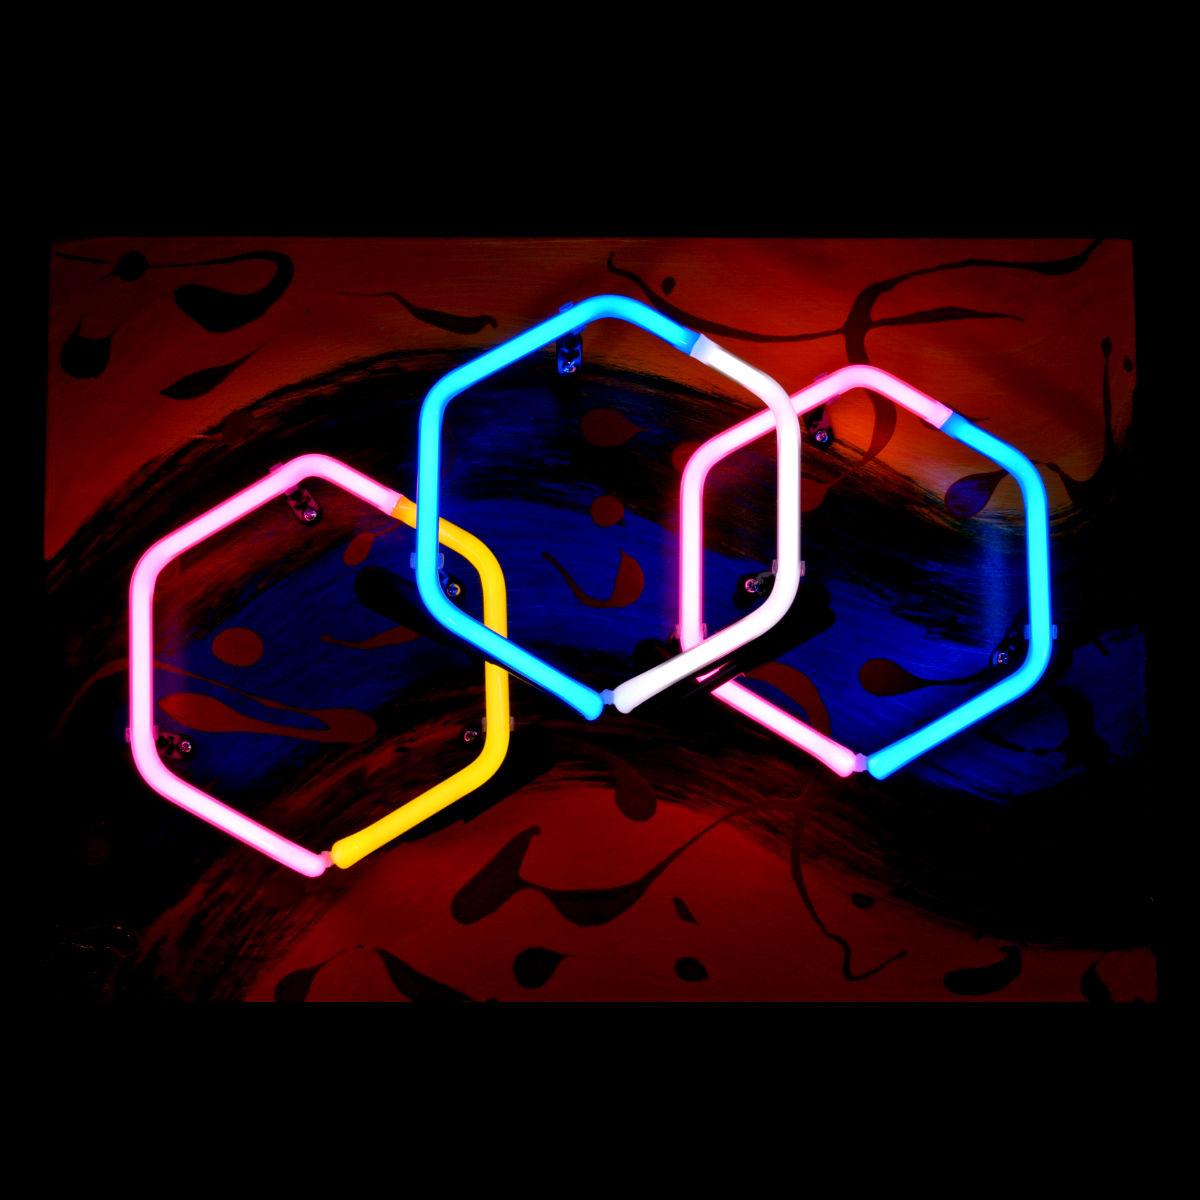 High End Neon Artworks by John Barton - Famous USA Neon Glass Artist - BartonNeonMagic.com